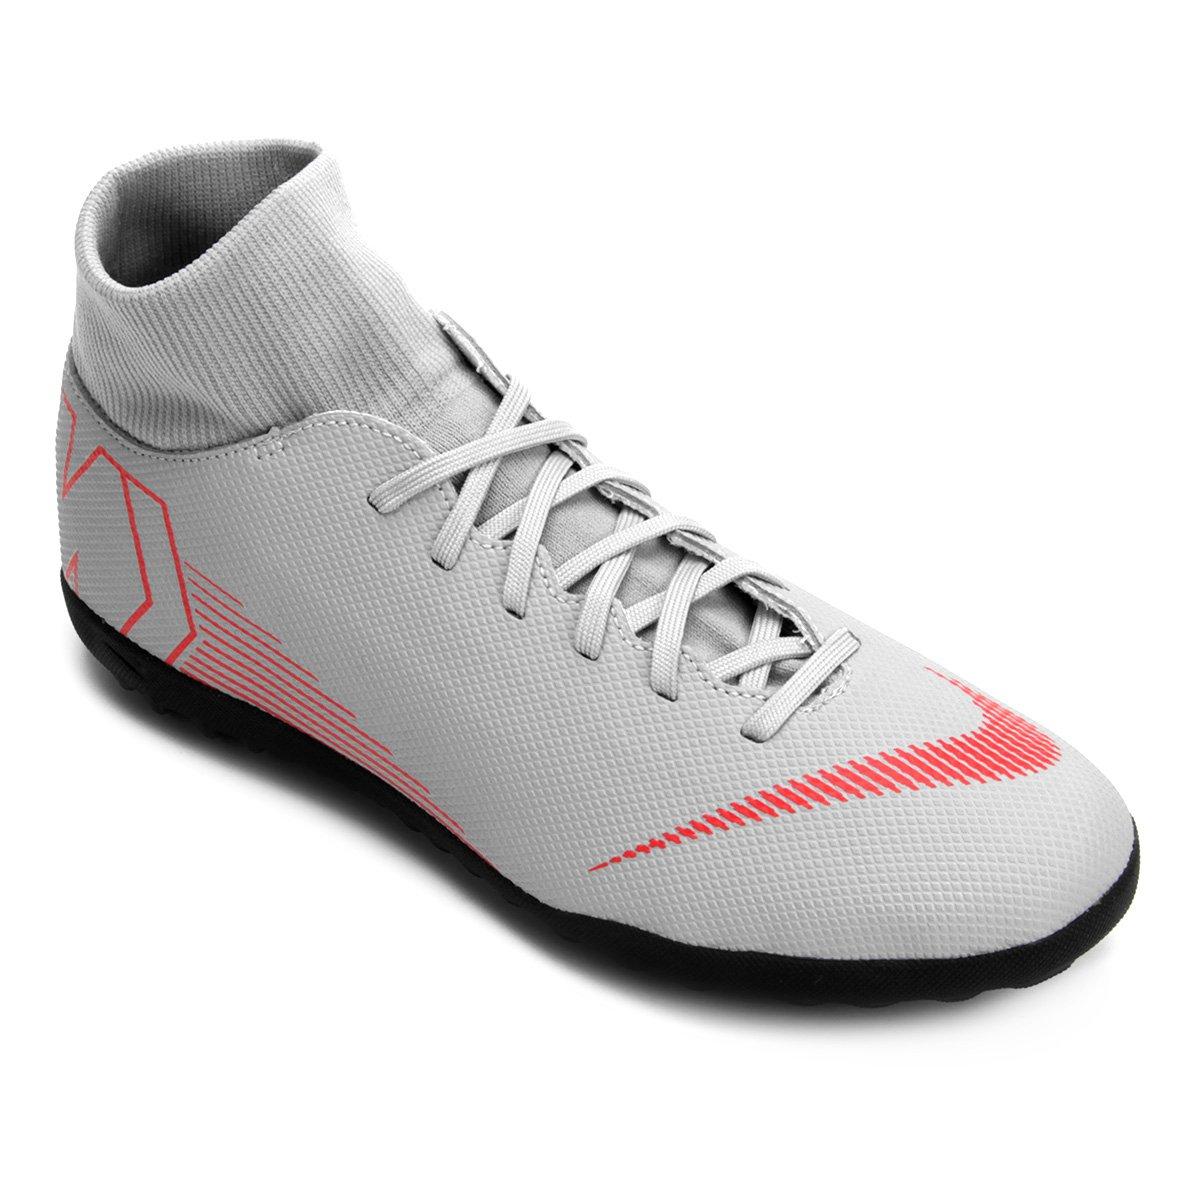 bca74408ae717 Chuteira Society Nike Mercurial Superfly 6 Club - Cinza - Compre ...